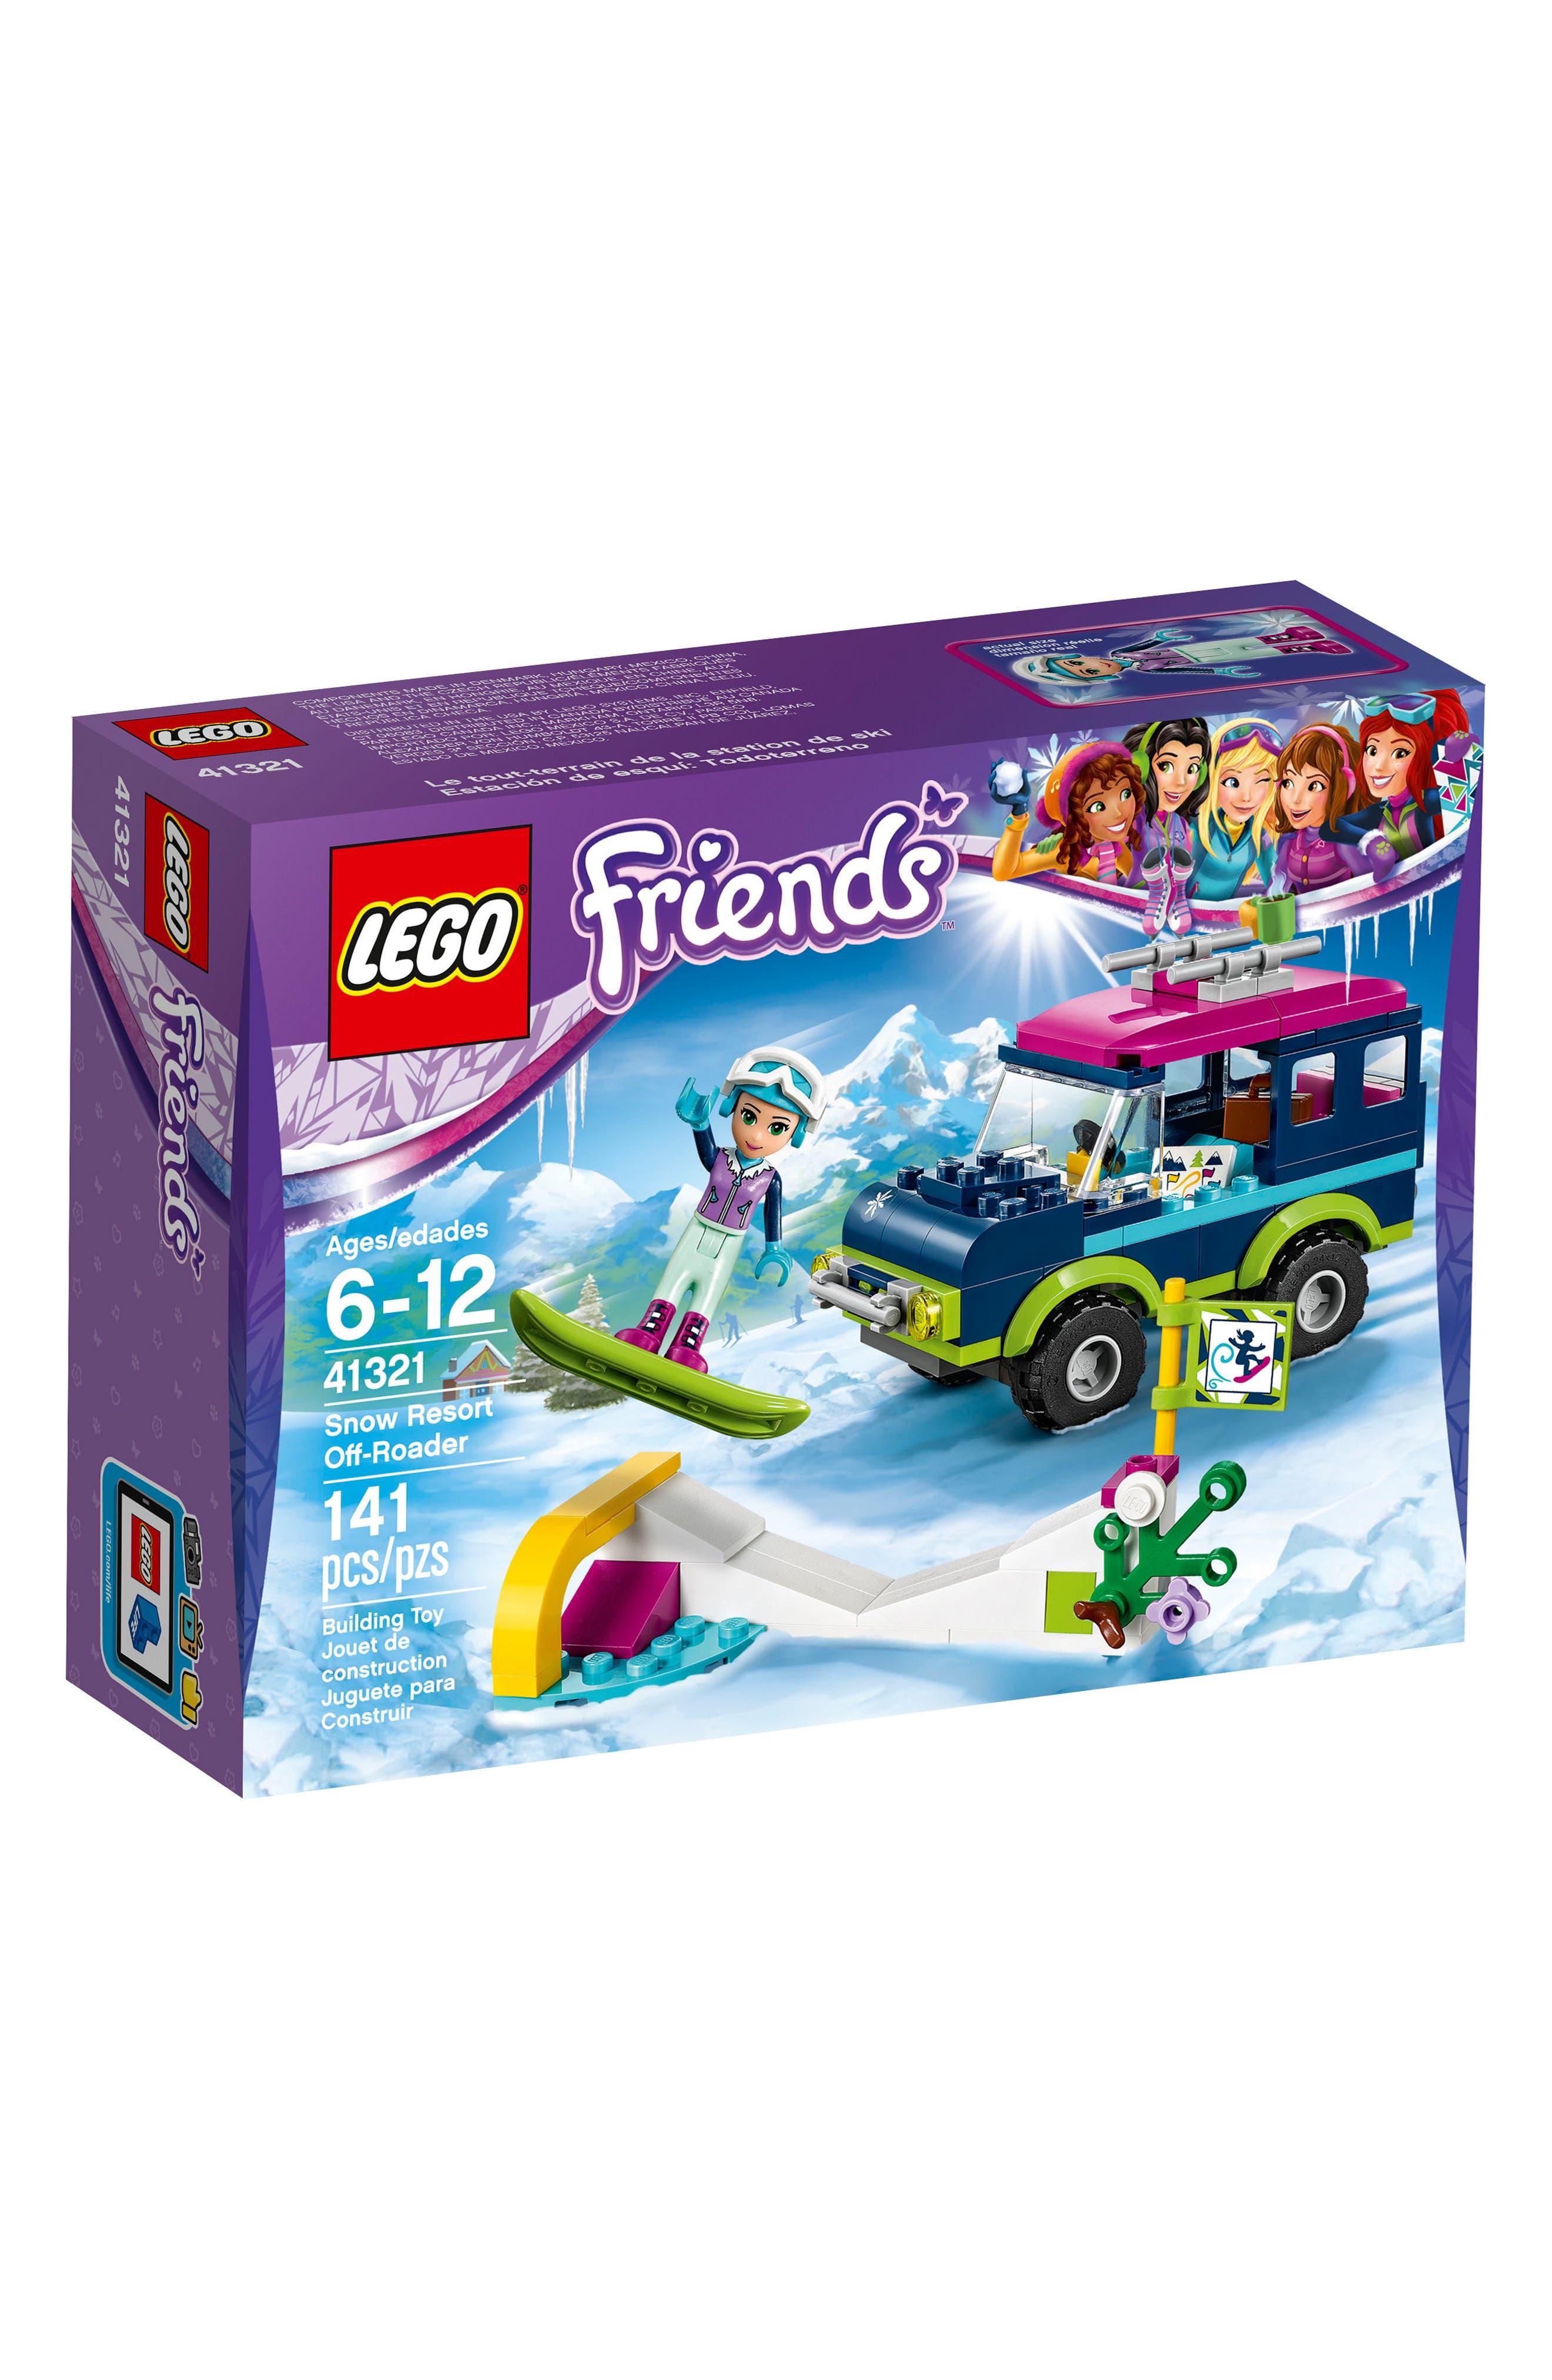 LEGO® Friends Snow Resort Off-Roader - 41321